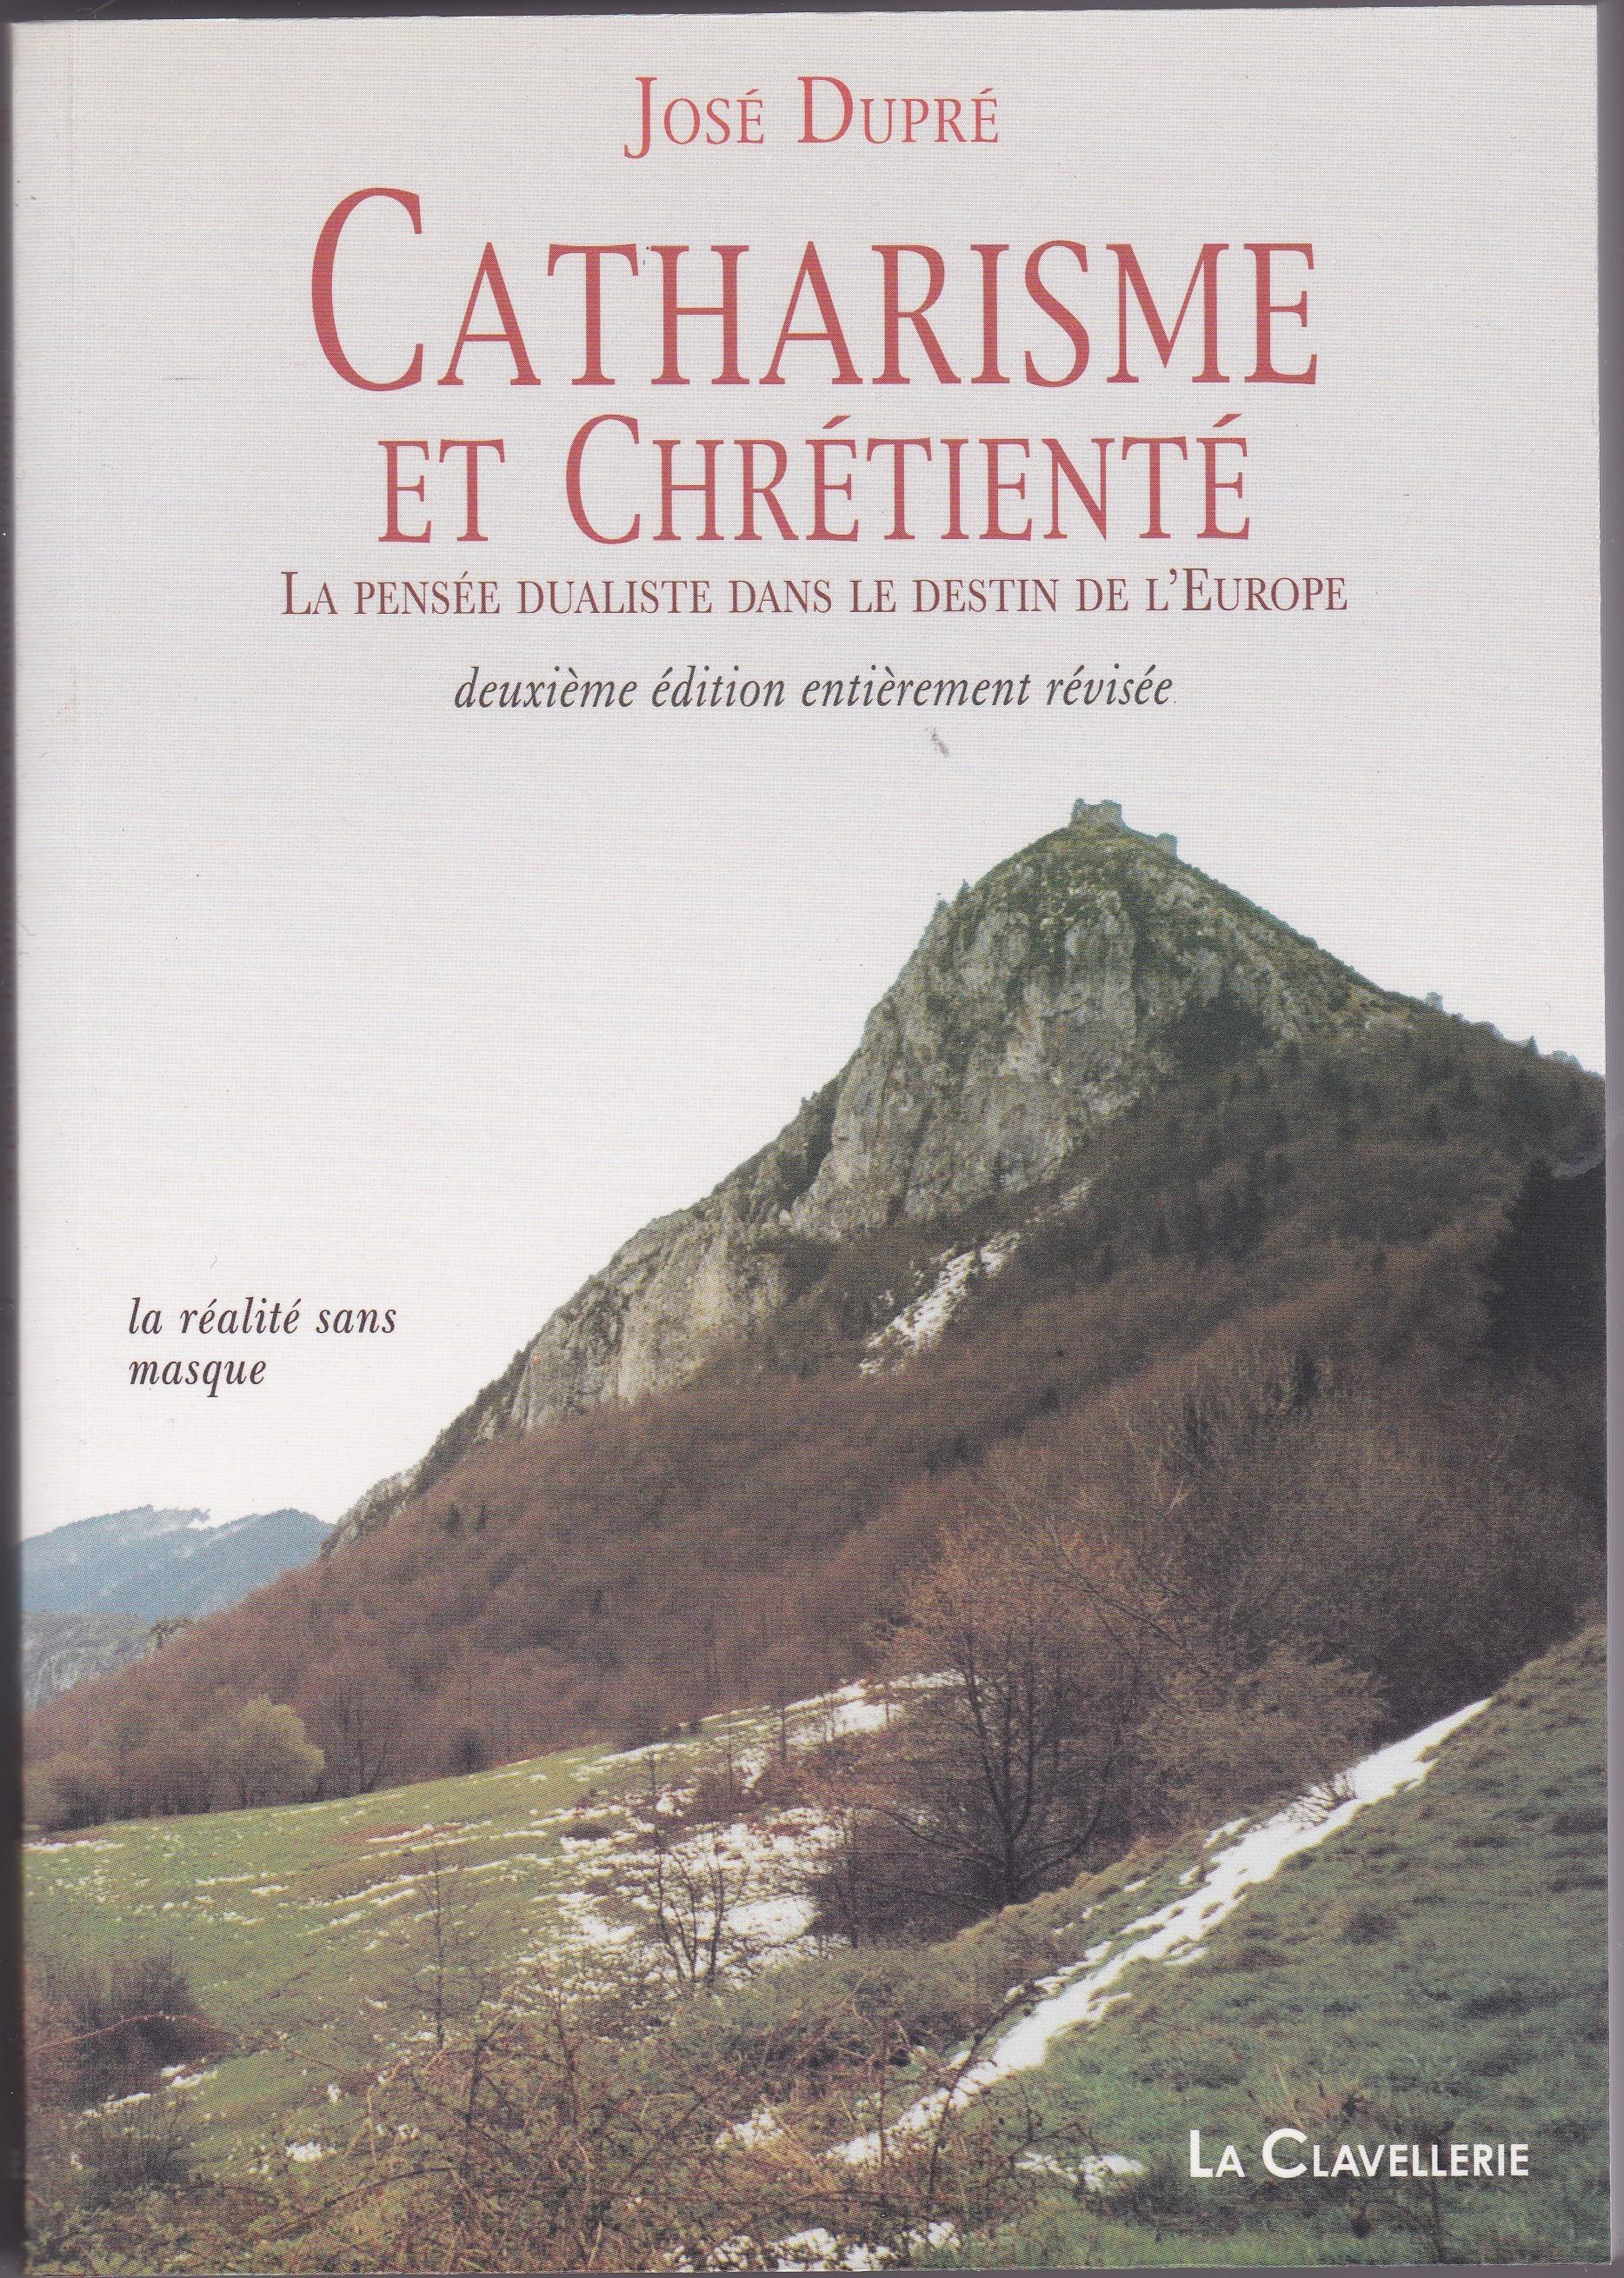 CATHARISME ET CHRETIENTE